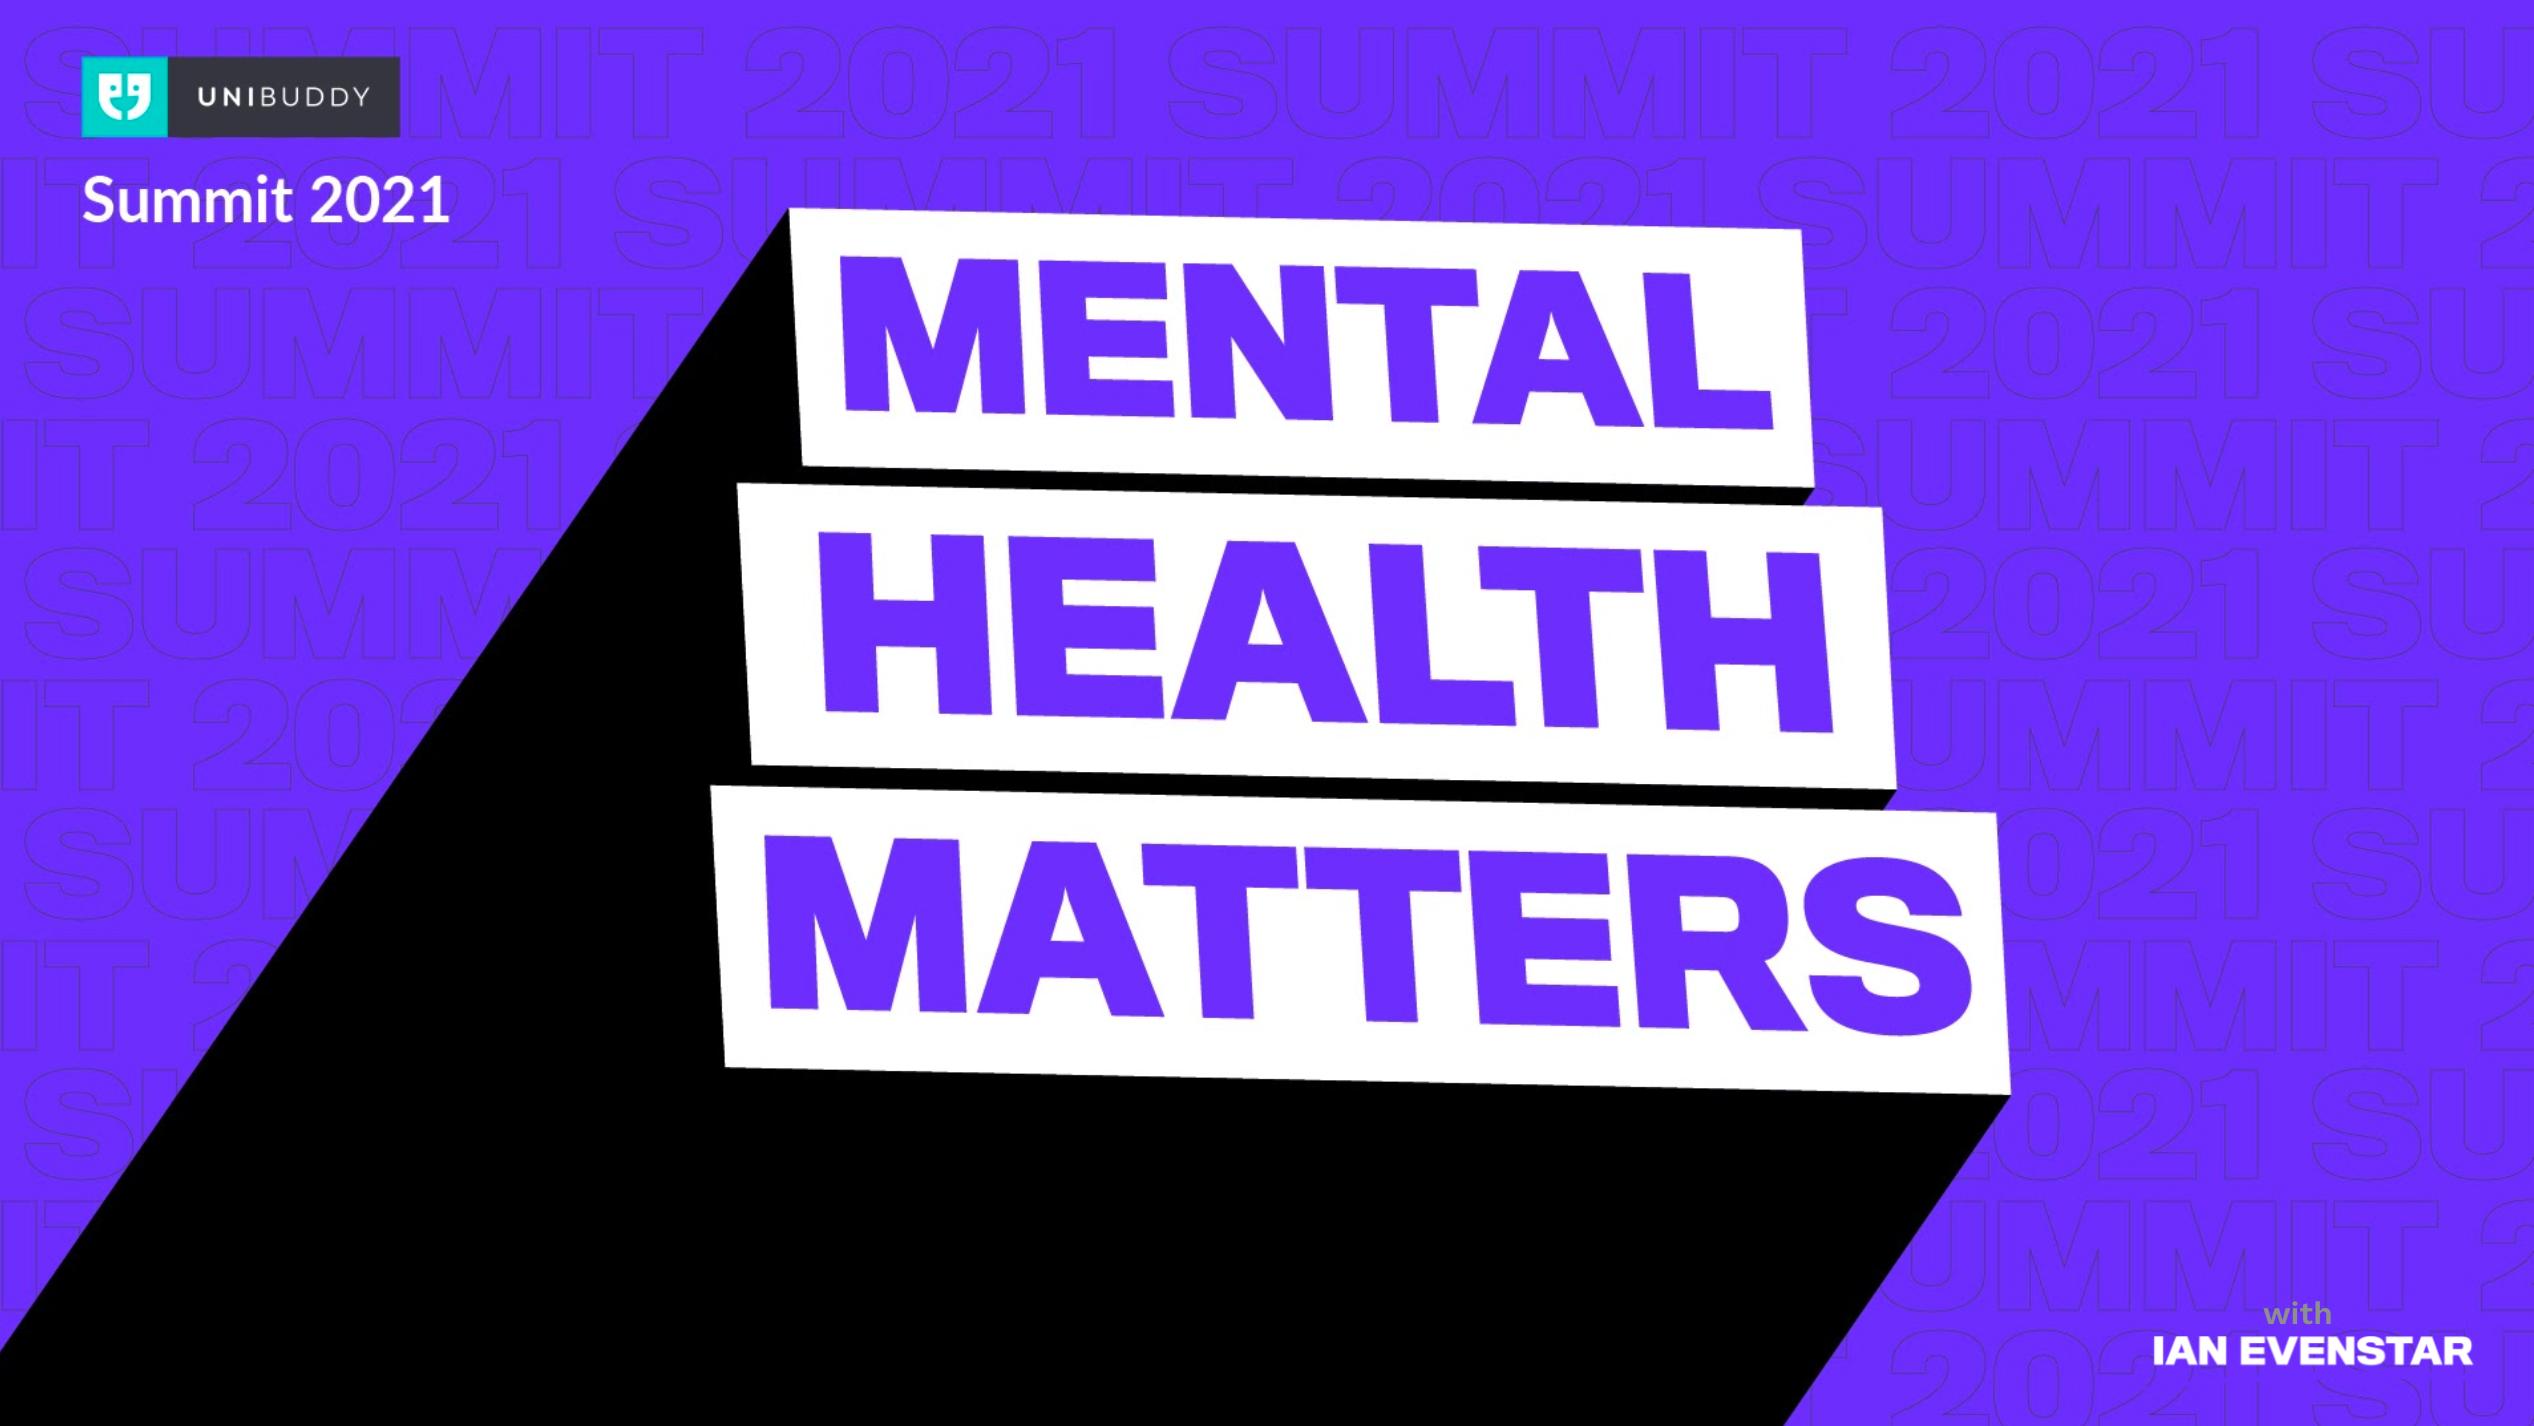 Mental_Health_Matters_Cover_Art